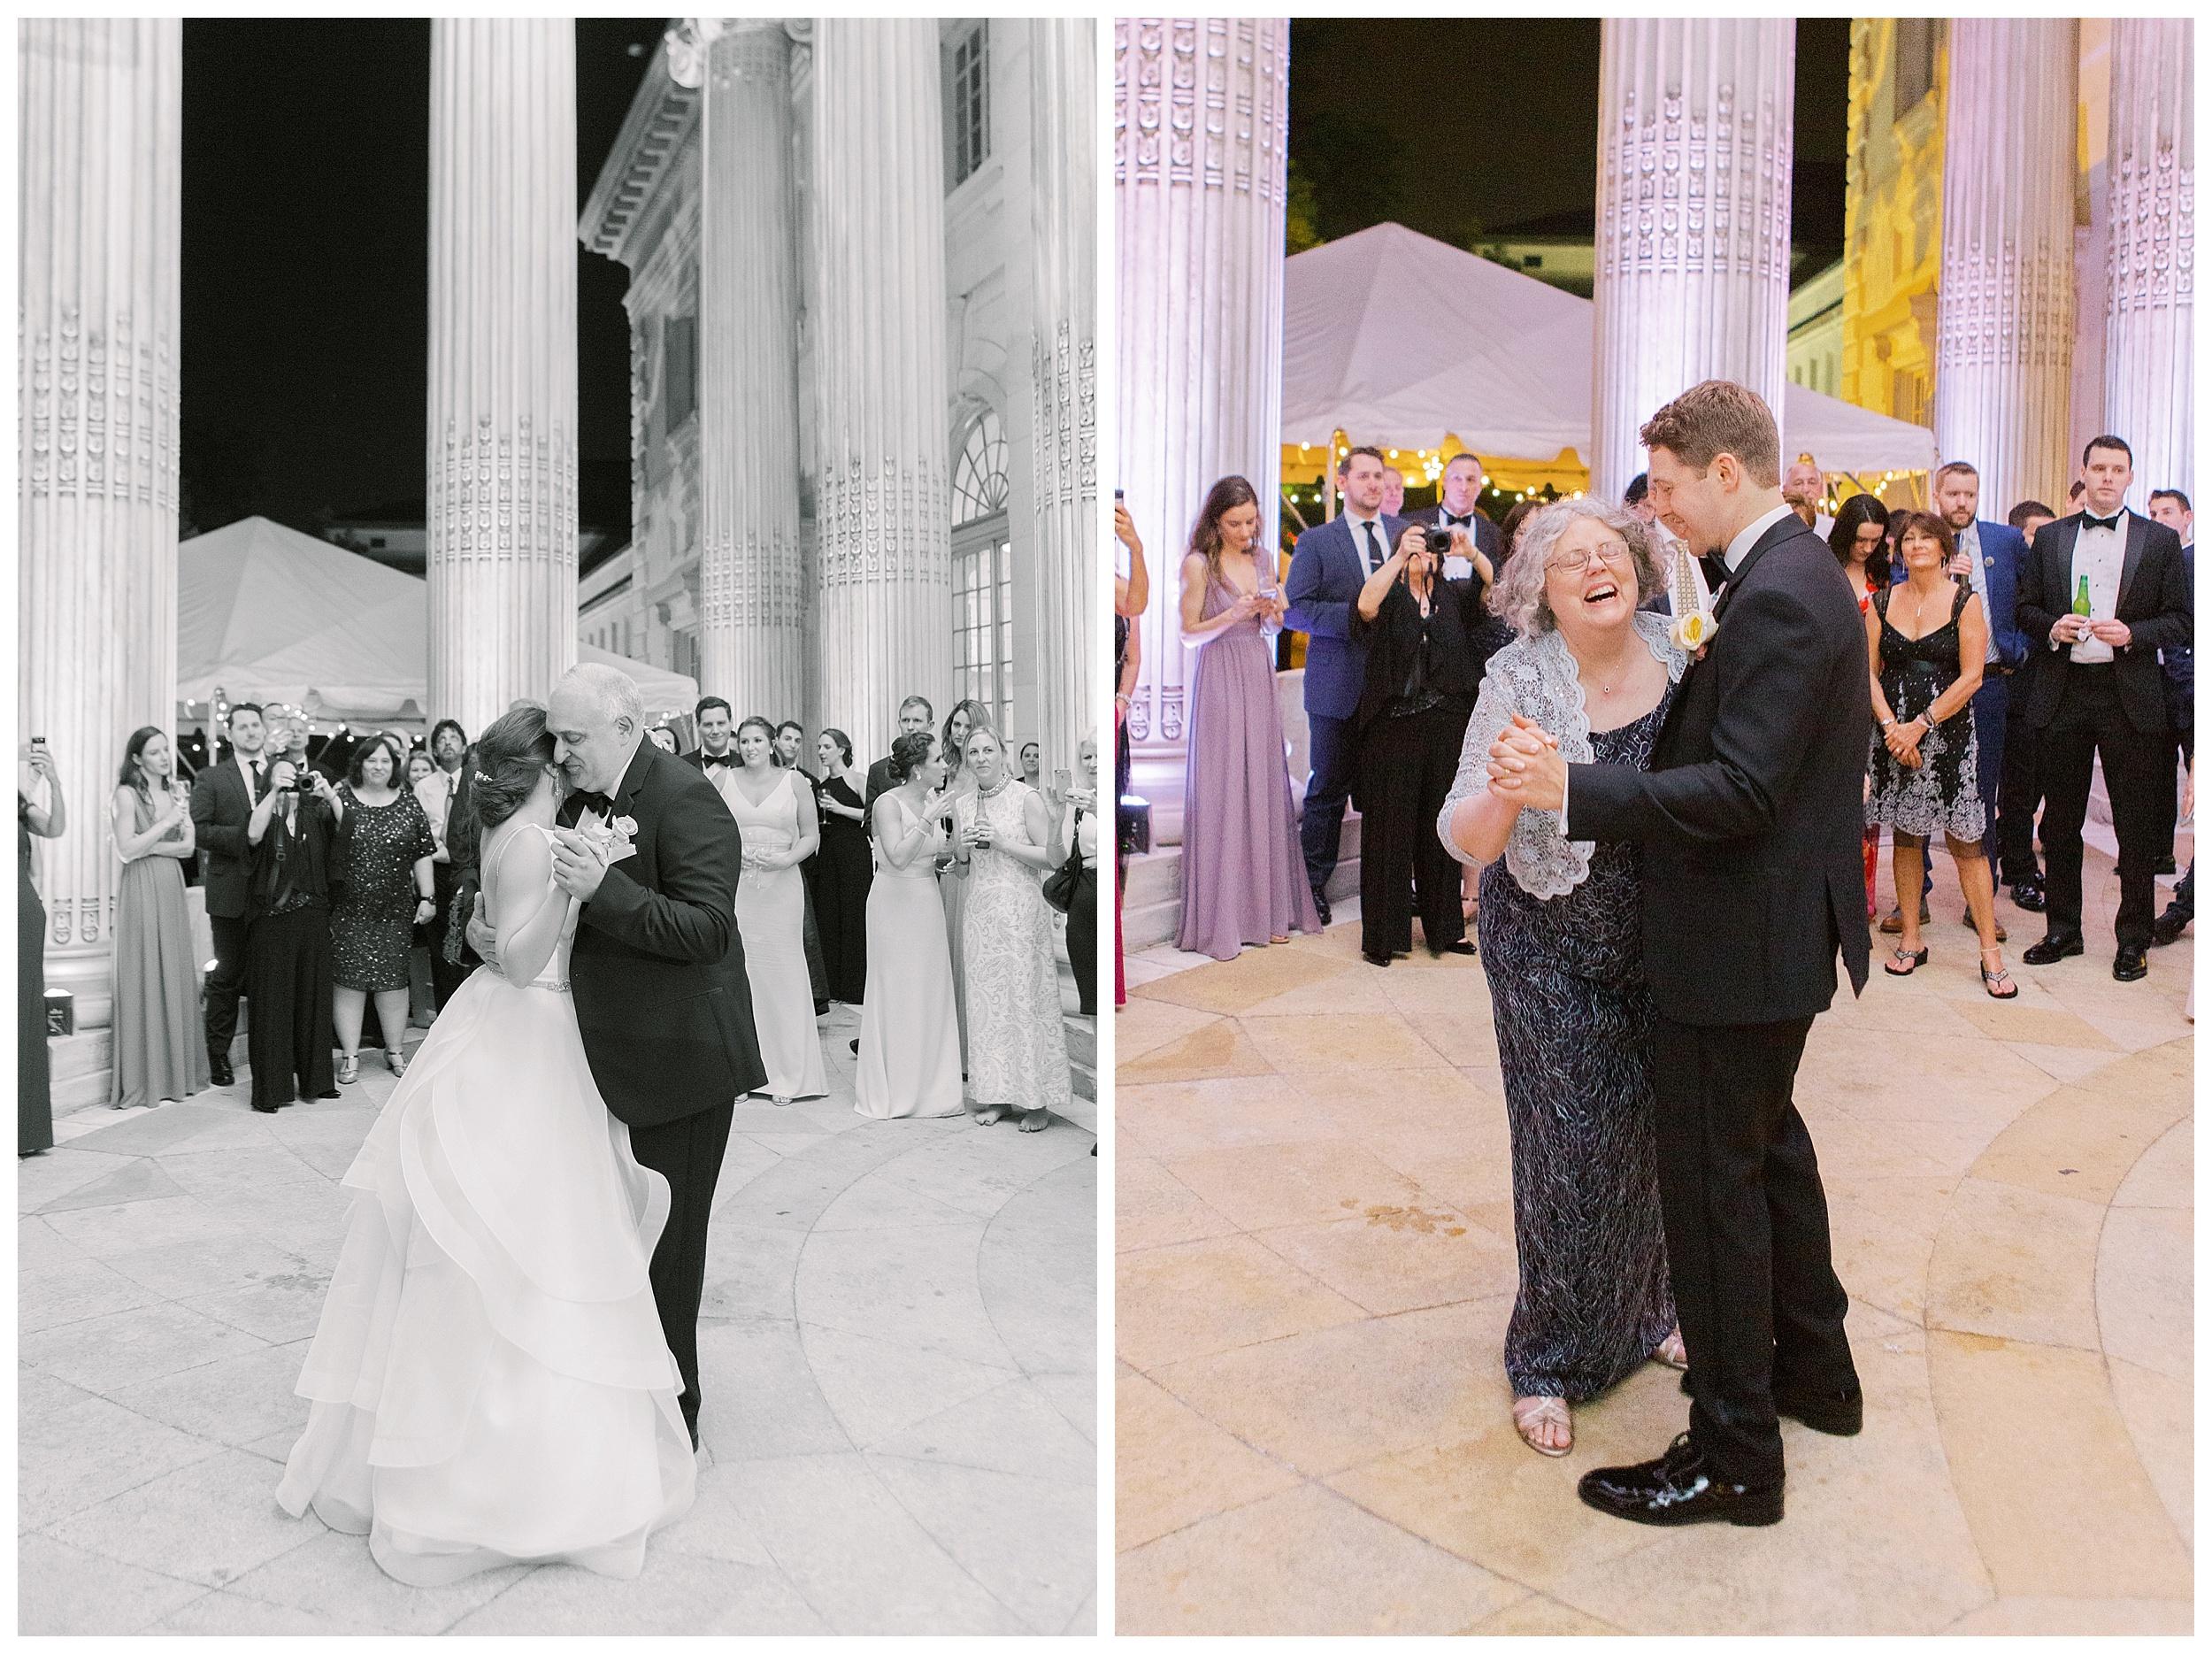 DAR Constitution Hall Wedding Wedding | Daughters of the American Revolution Wedding | District of Columbia Film Wedding Photographer Kir Tuben_0139.jpg